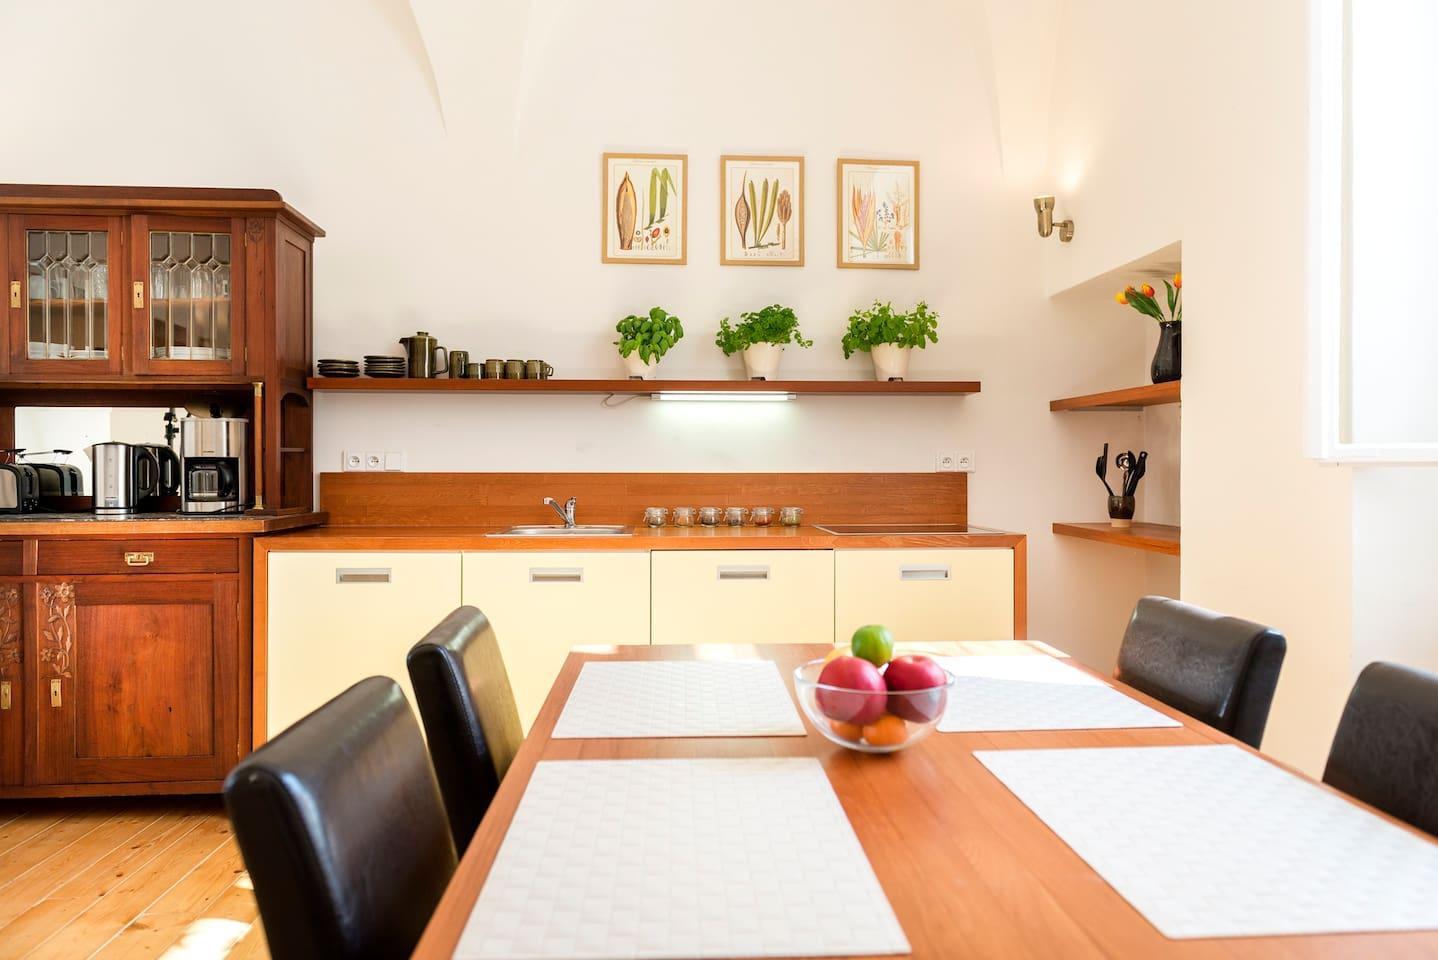 Spacious kitchen: hob, fridge, dishwasher, microwave, coffee maker,